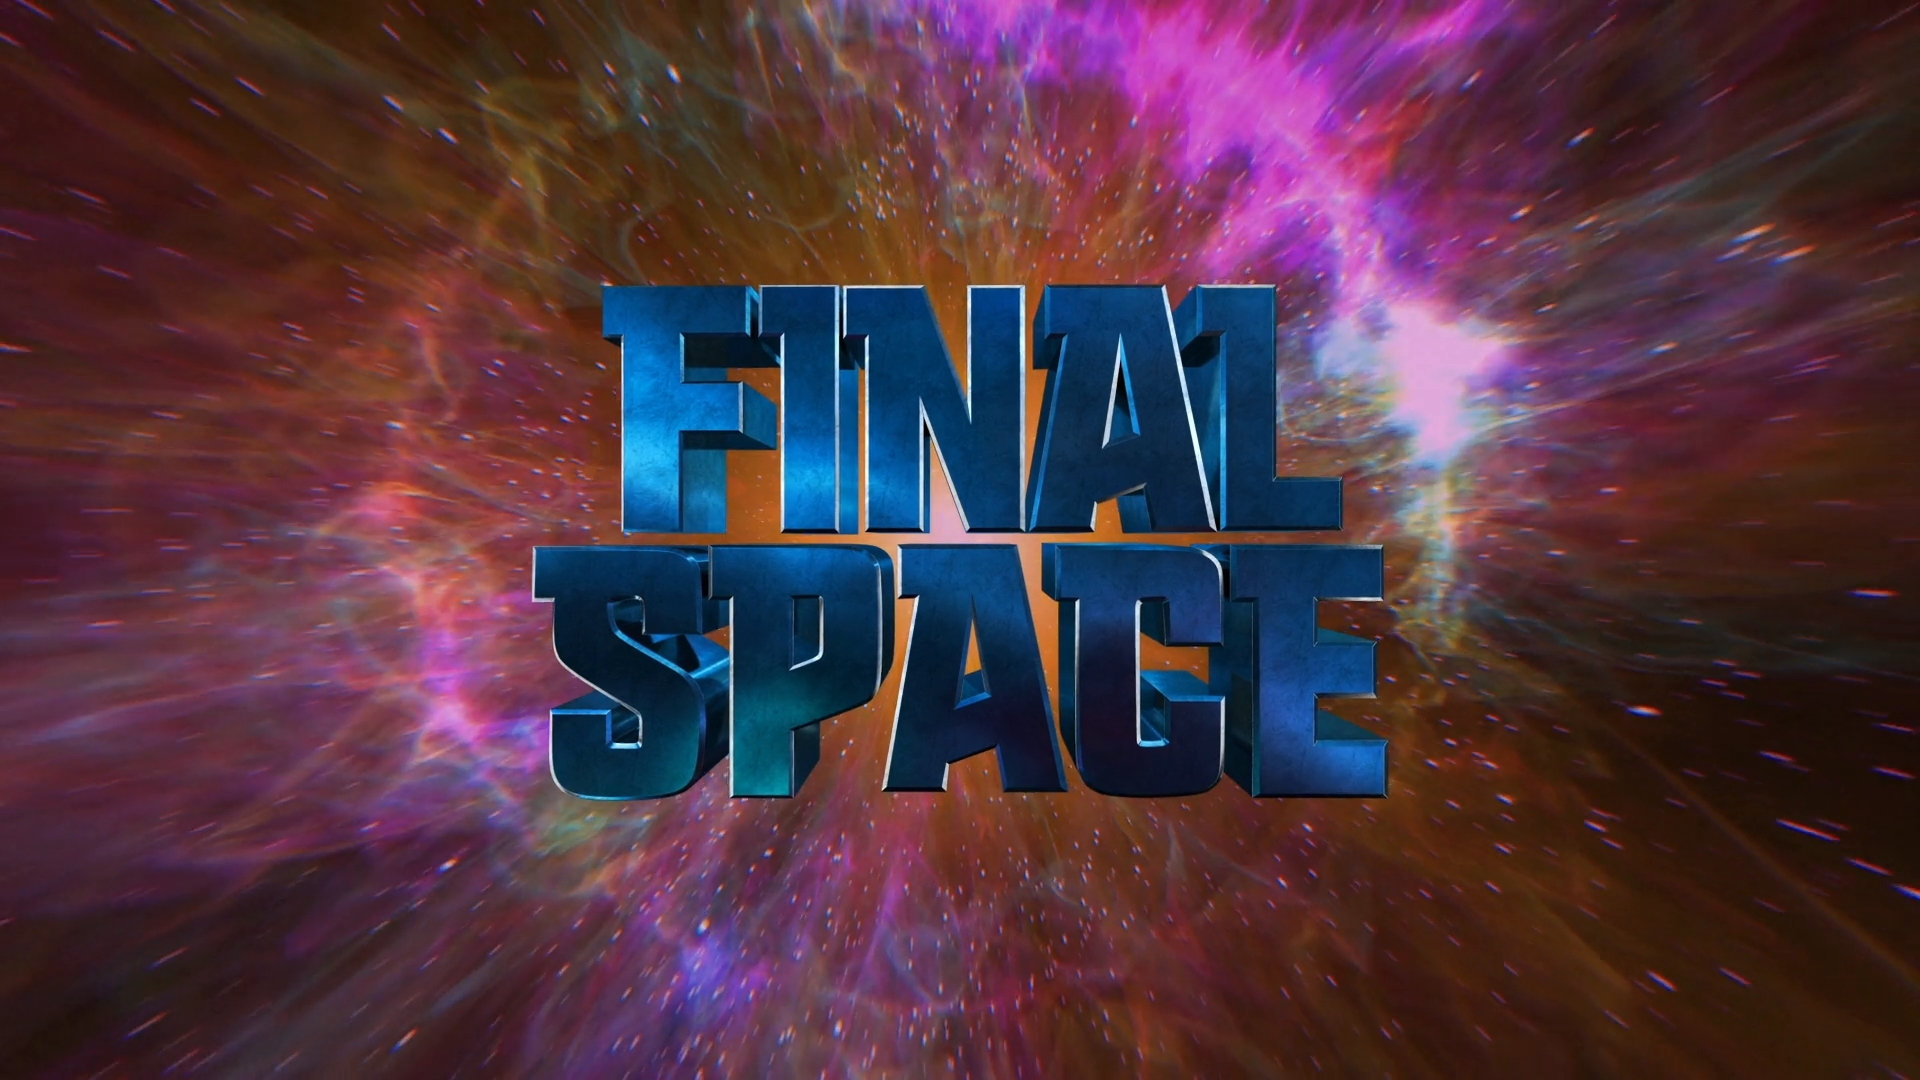 Final Space Temporada 3 (2021) 1080p WEB-DL Latino